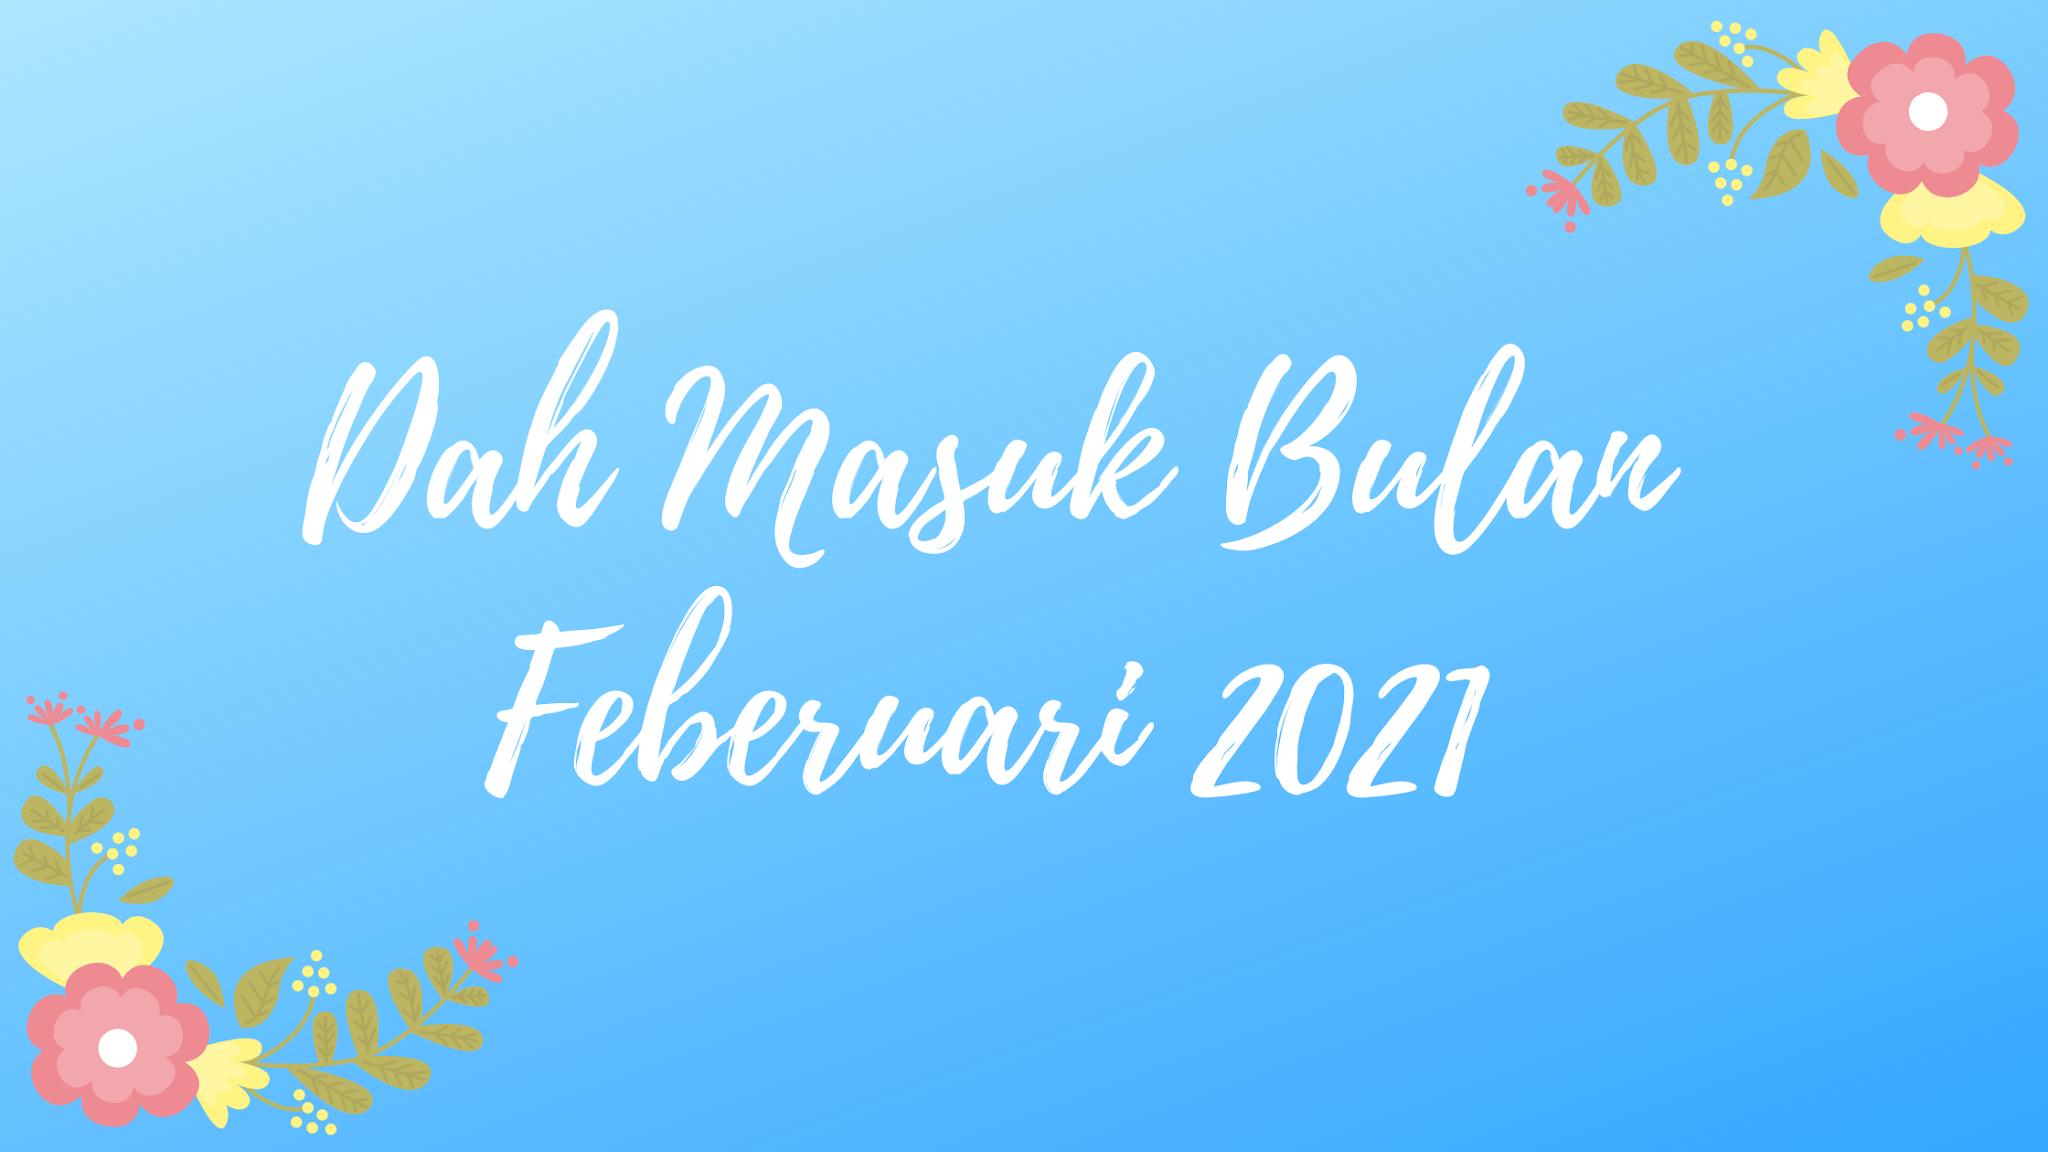 bulan feb 2021